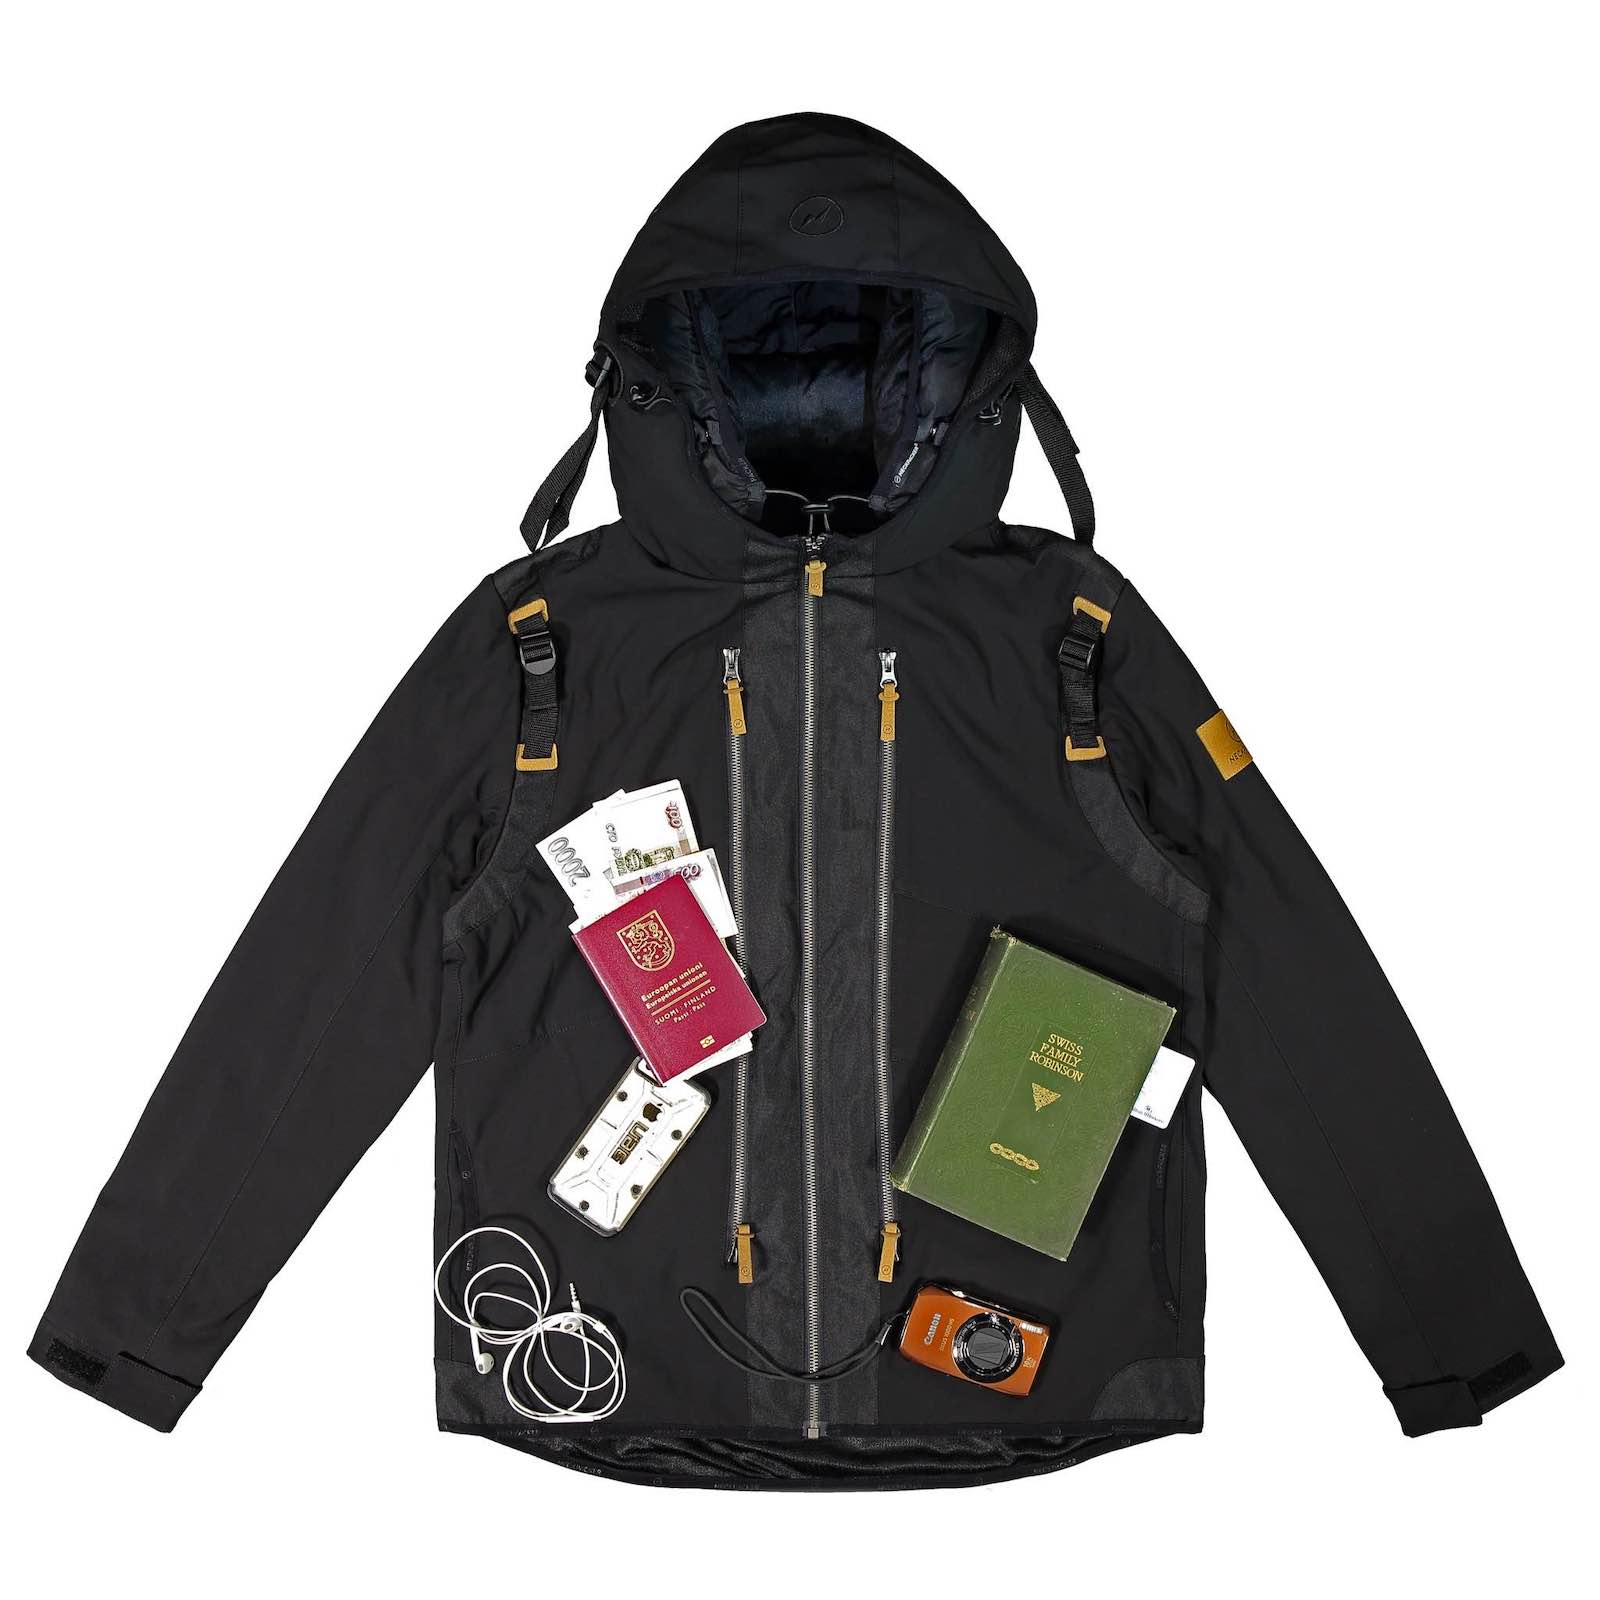 Netpacker Jacket